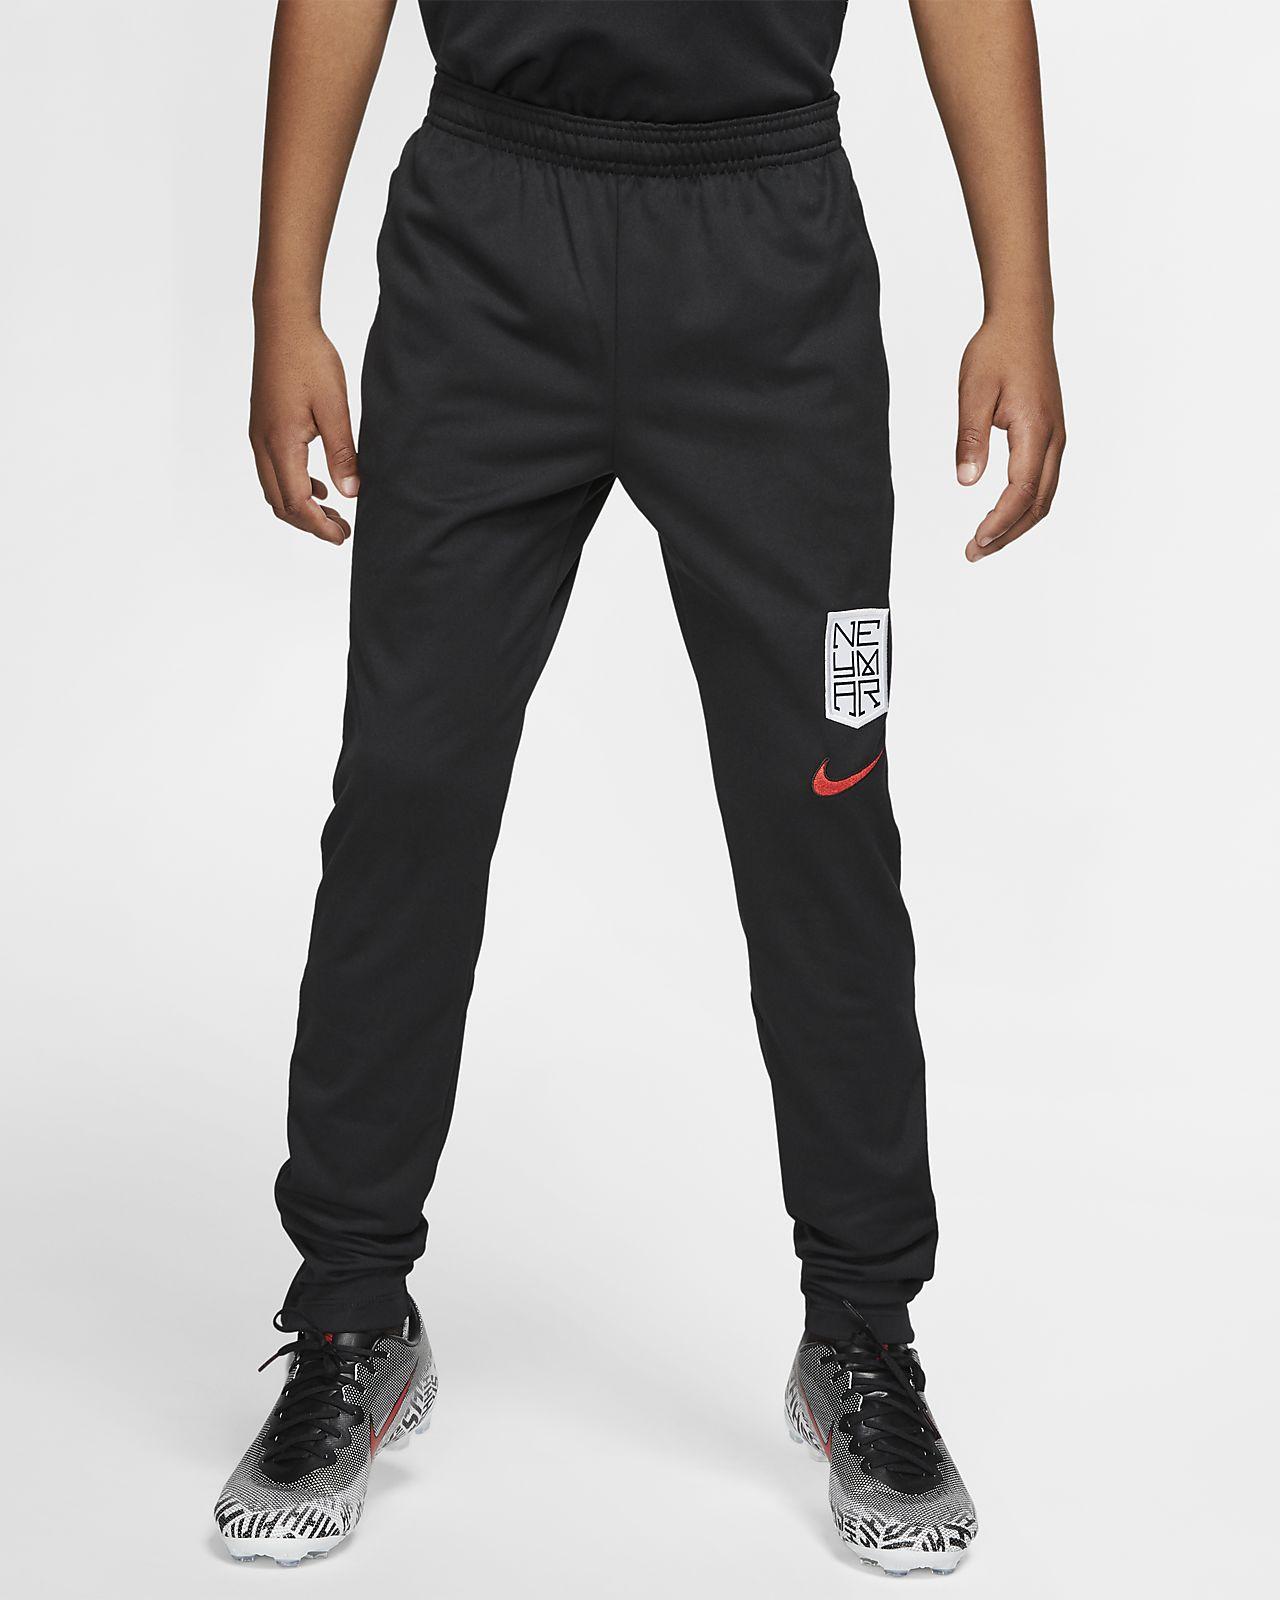 e4ead8e5935d0 ... Pantalones de fútbol para niños talla grande Nike Dri-FIT Neymar Jr.